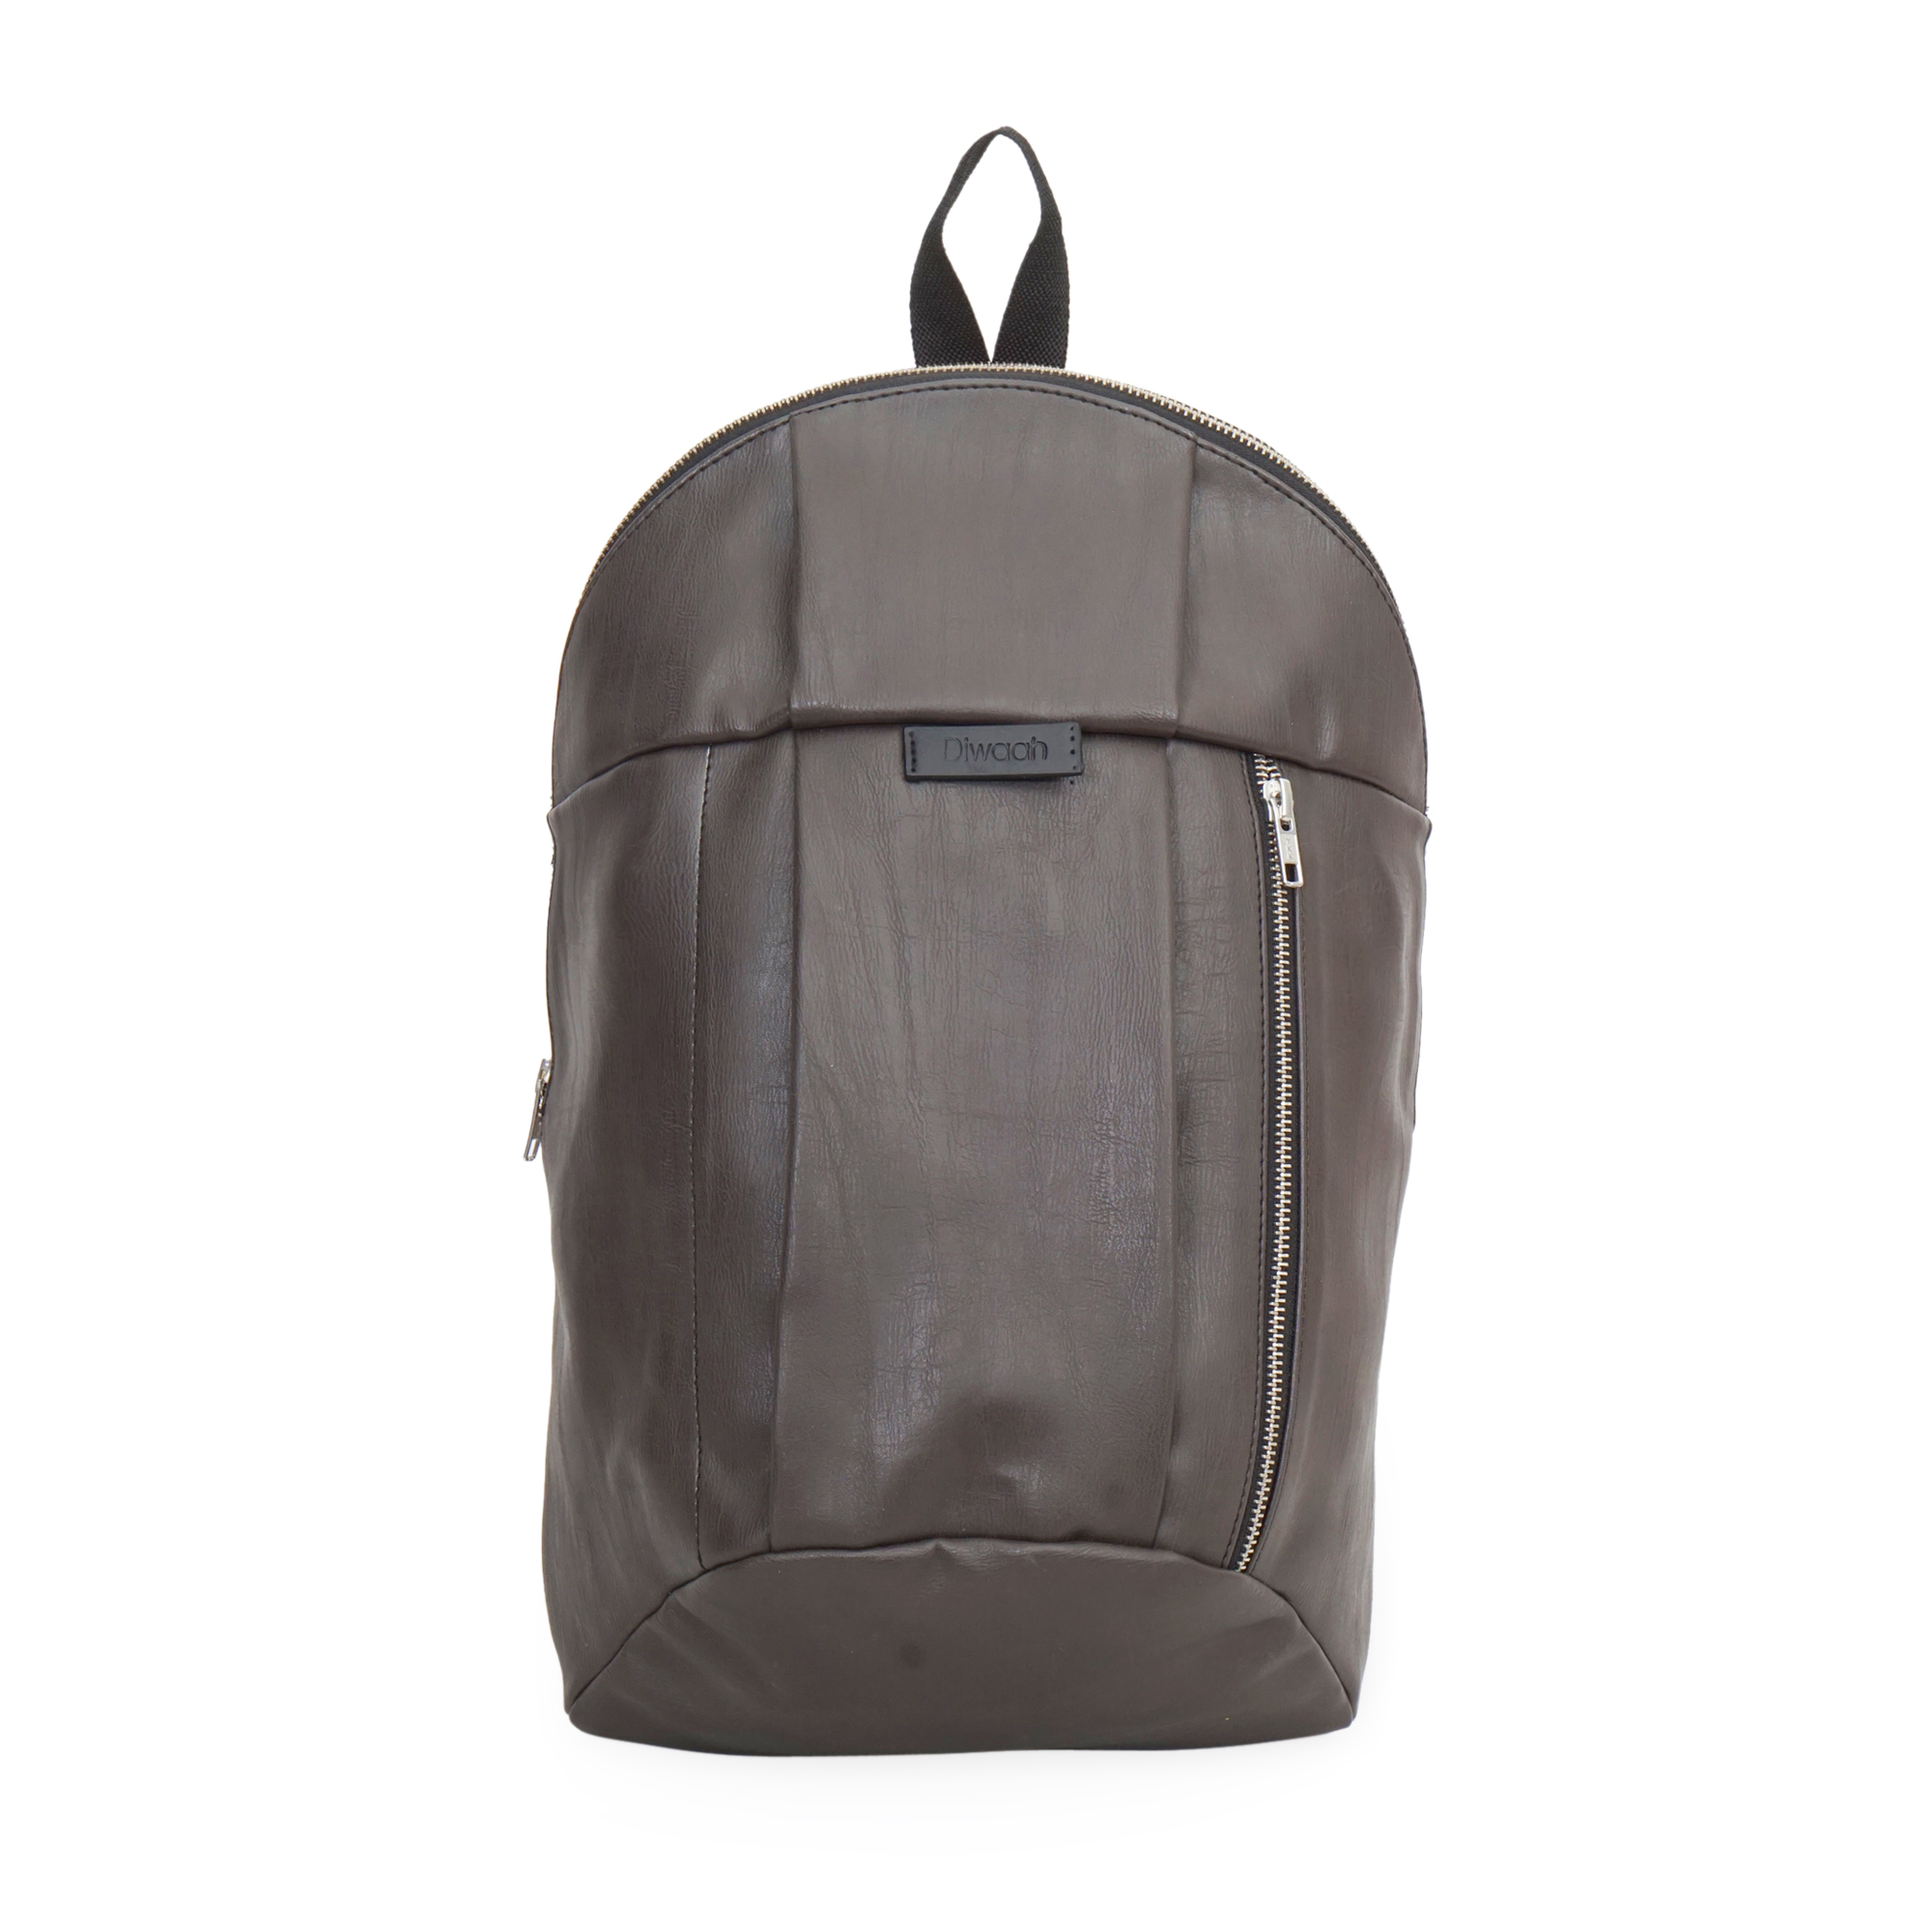 DIWAAH | Diwaah Green Color Casual Backpack